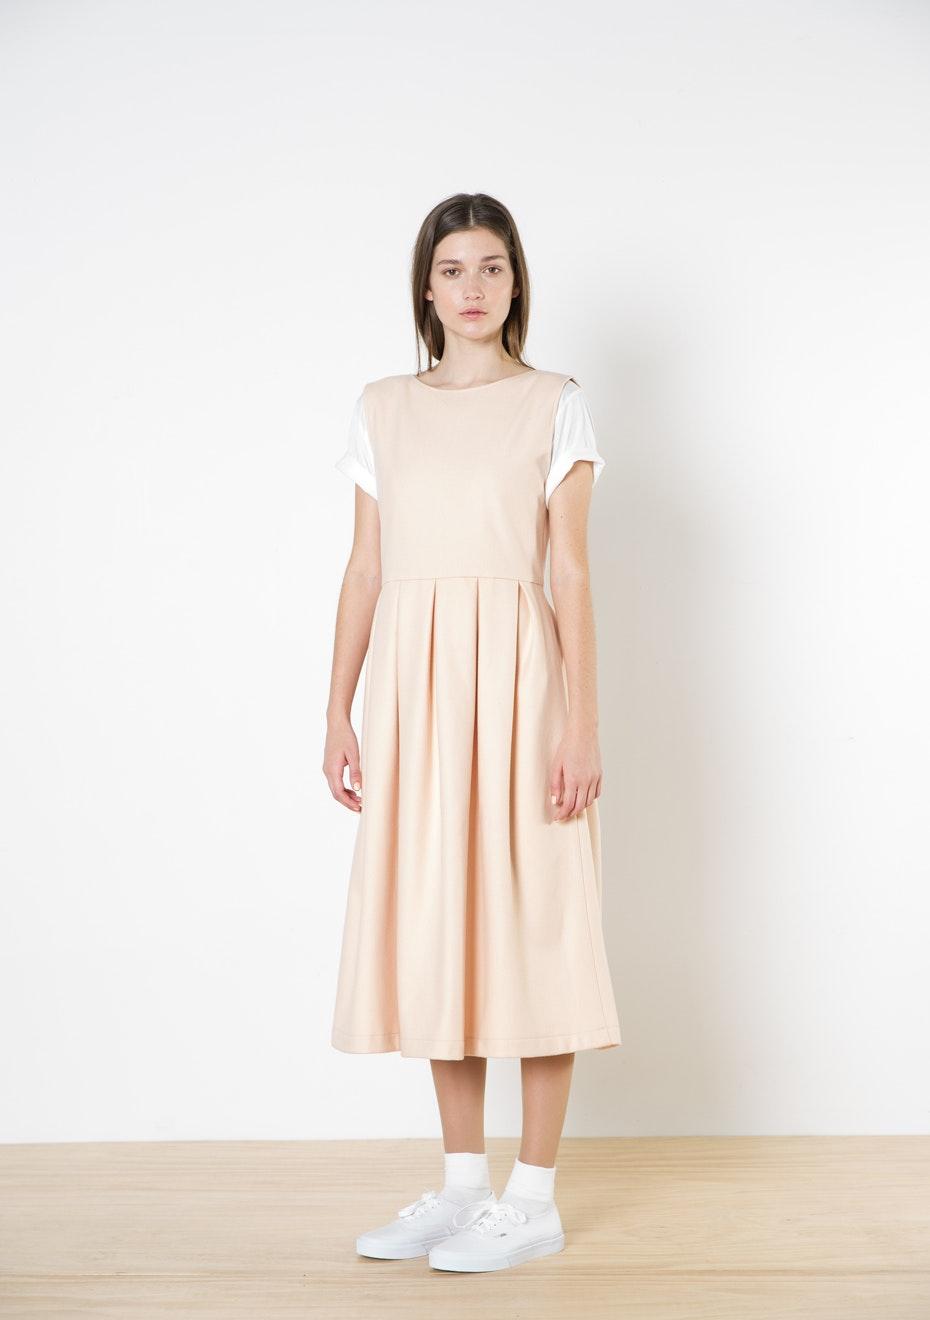 Twenty-Seven Names - Ava Wool Dress - Peach